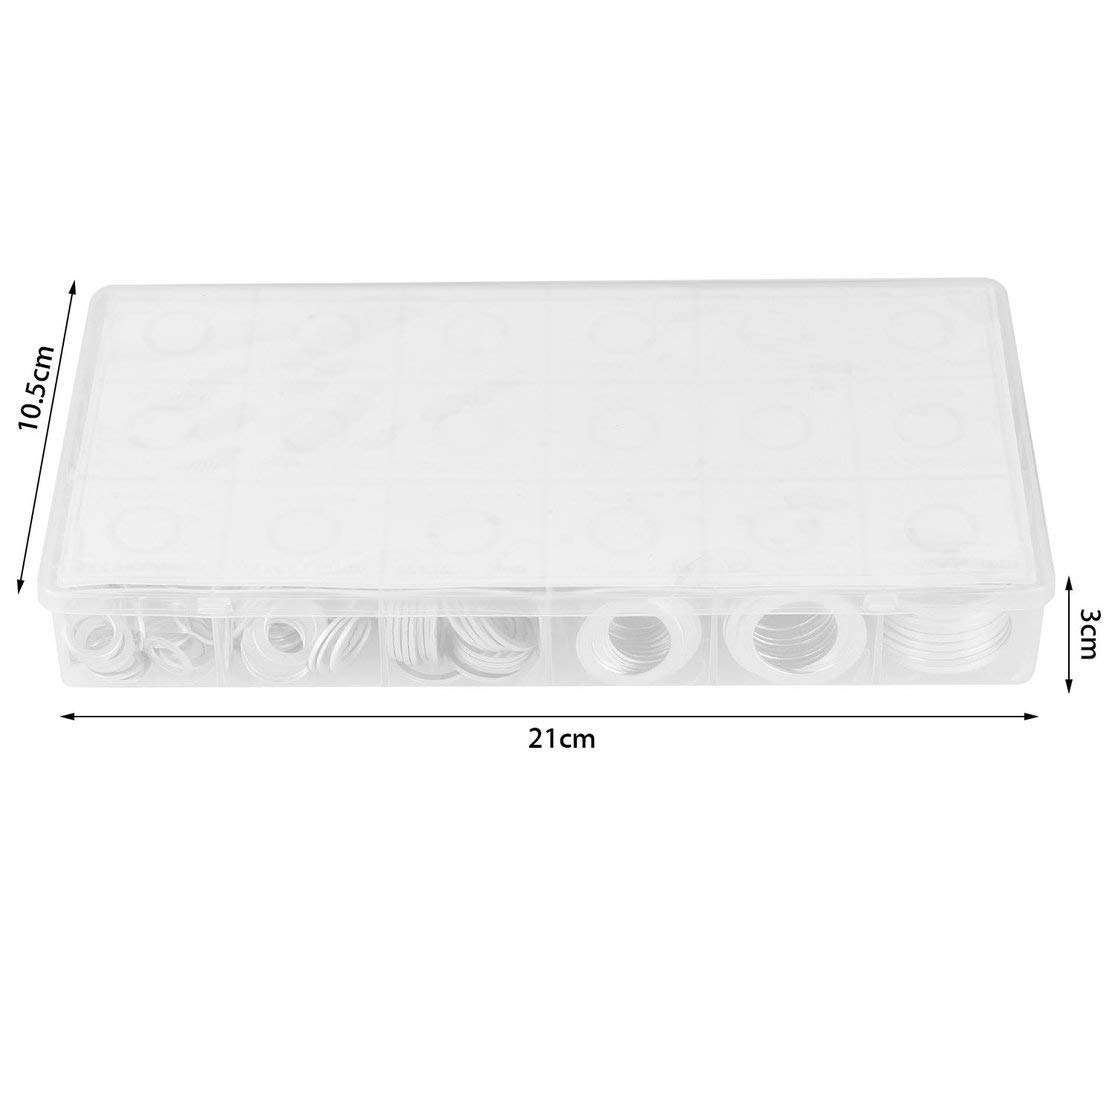 LouiseEvel215 450 st/ücke Versiegelt Sortiment Aluminiumdichtung Set Multifunktionale O-Ring Set Dichtring Set Mit Tragetasche Kit Set